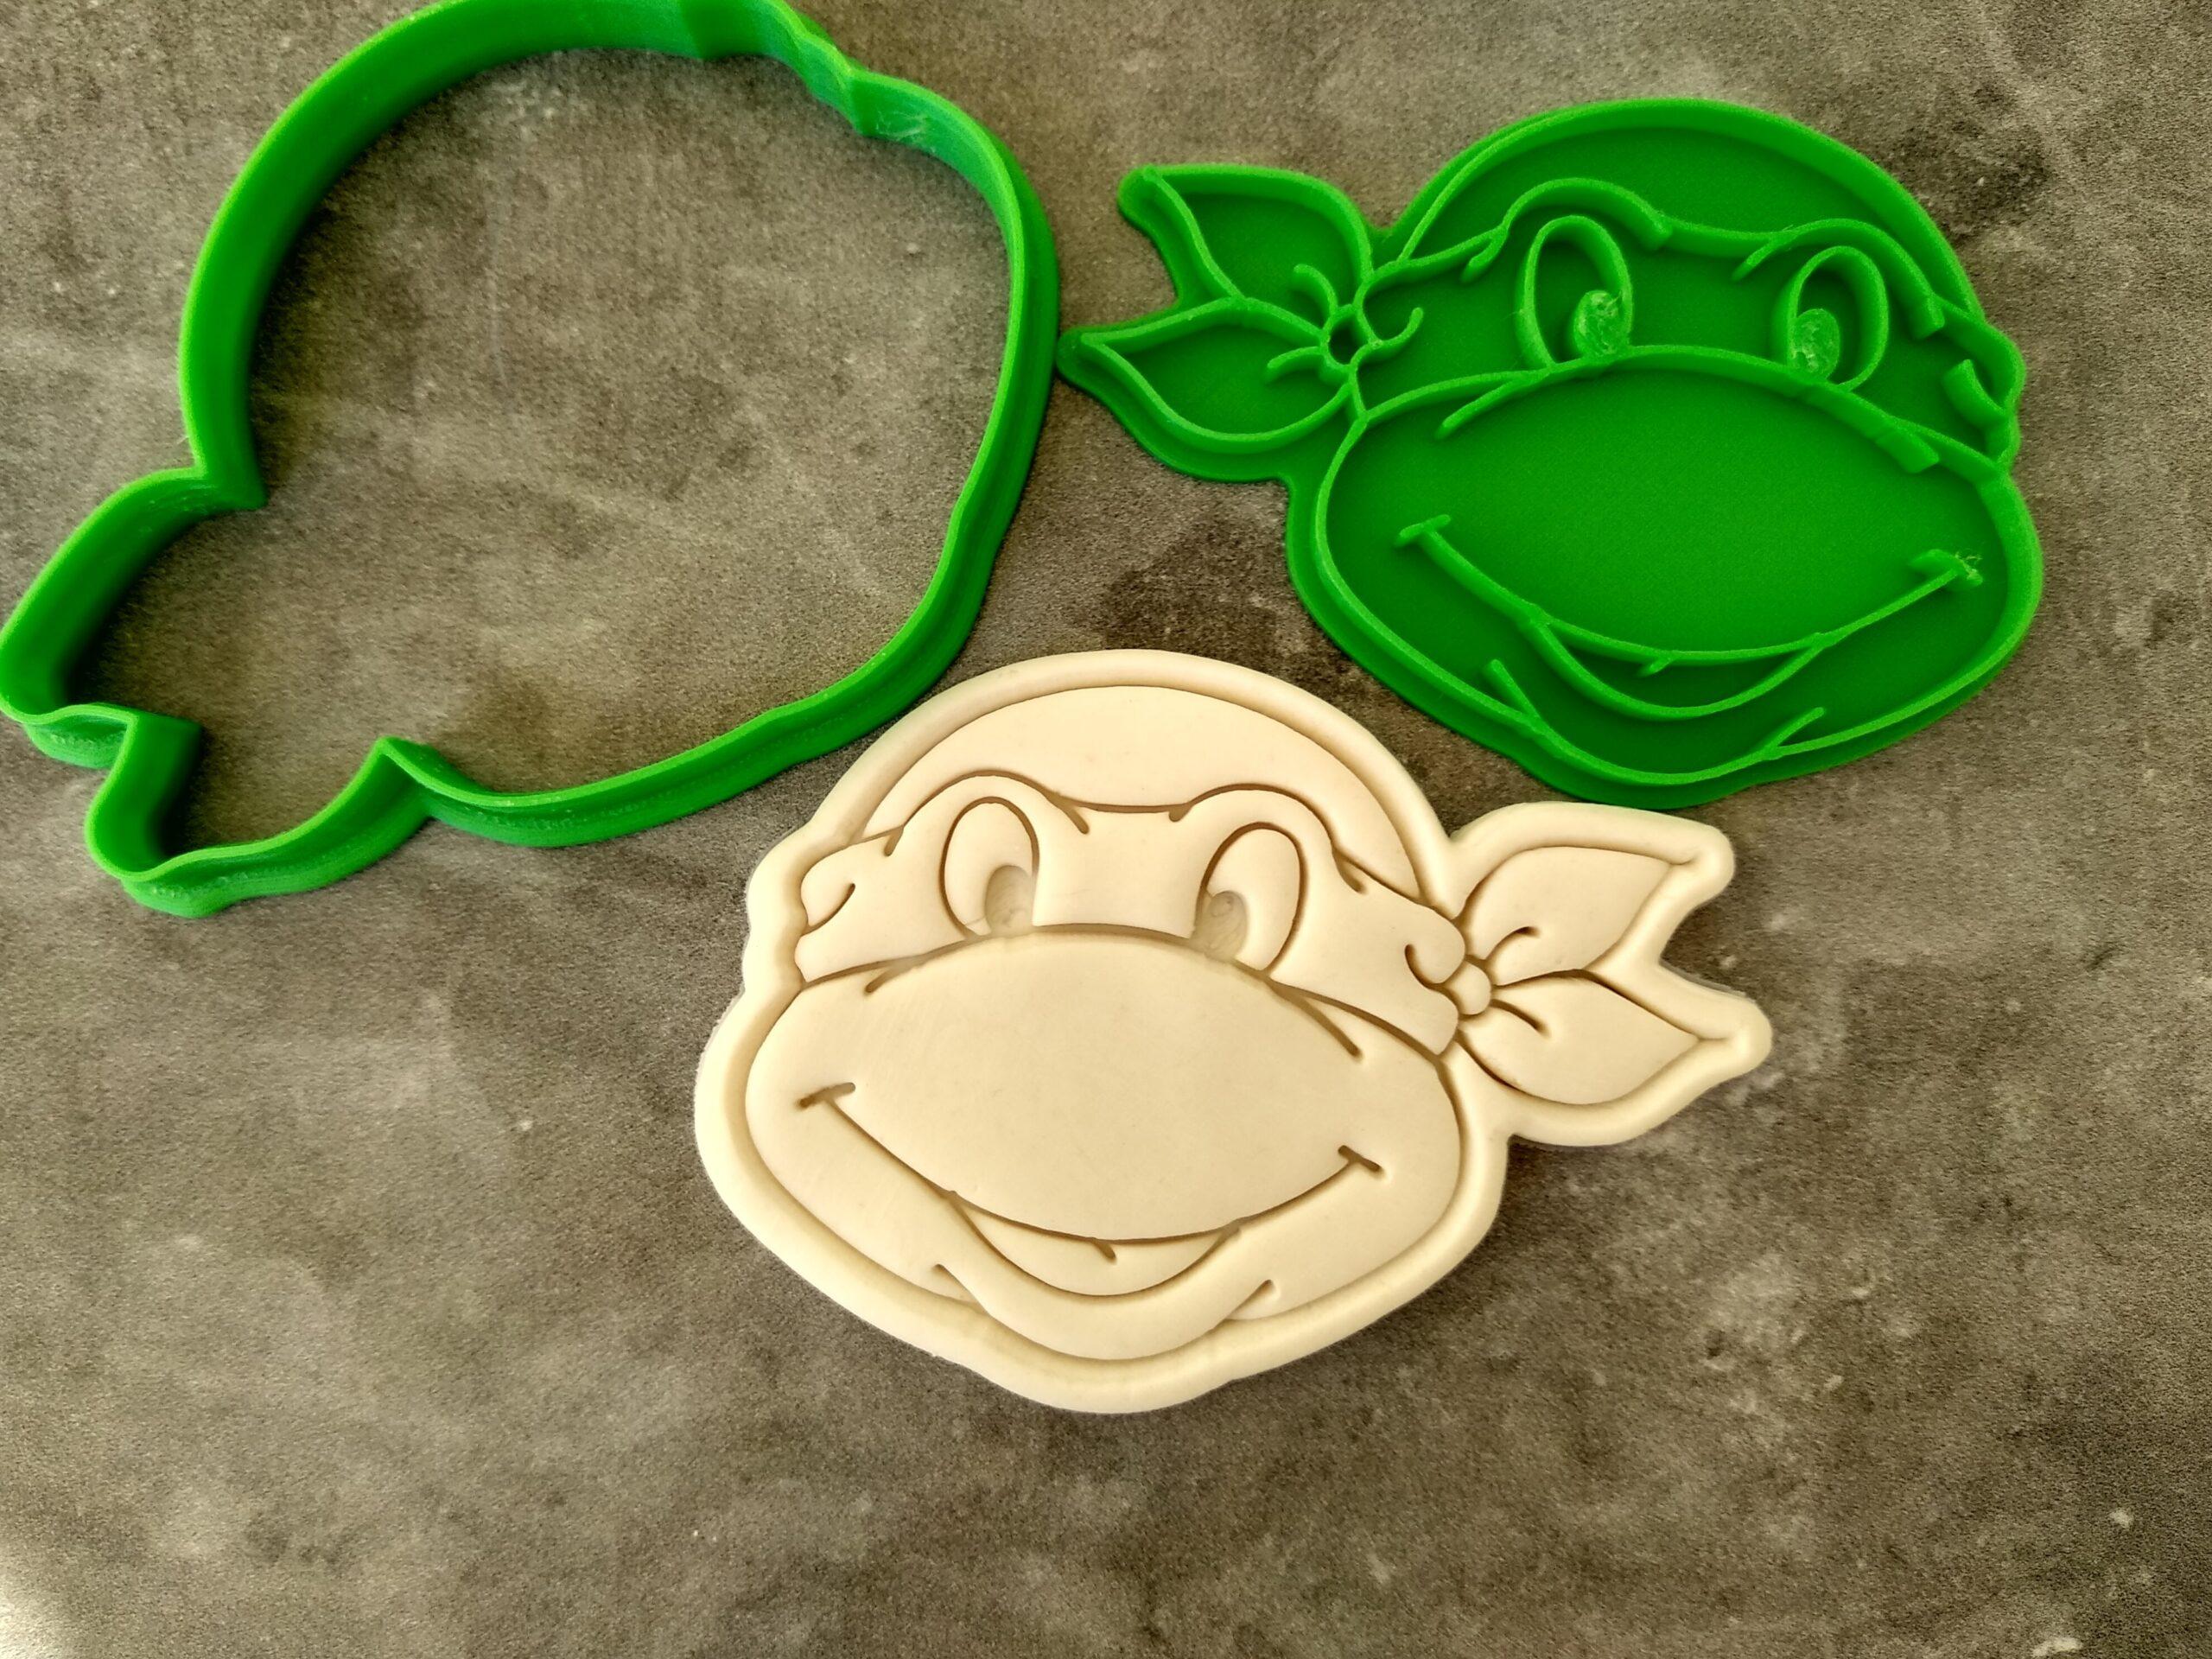 Teenage Mutant Ninja Turtles face Cookie Cutter and Fondant Stamp Embosser